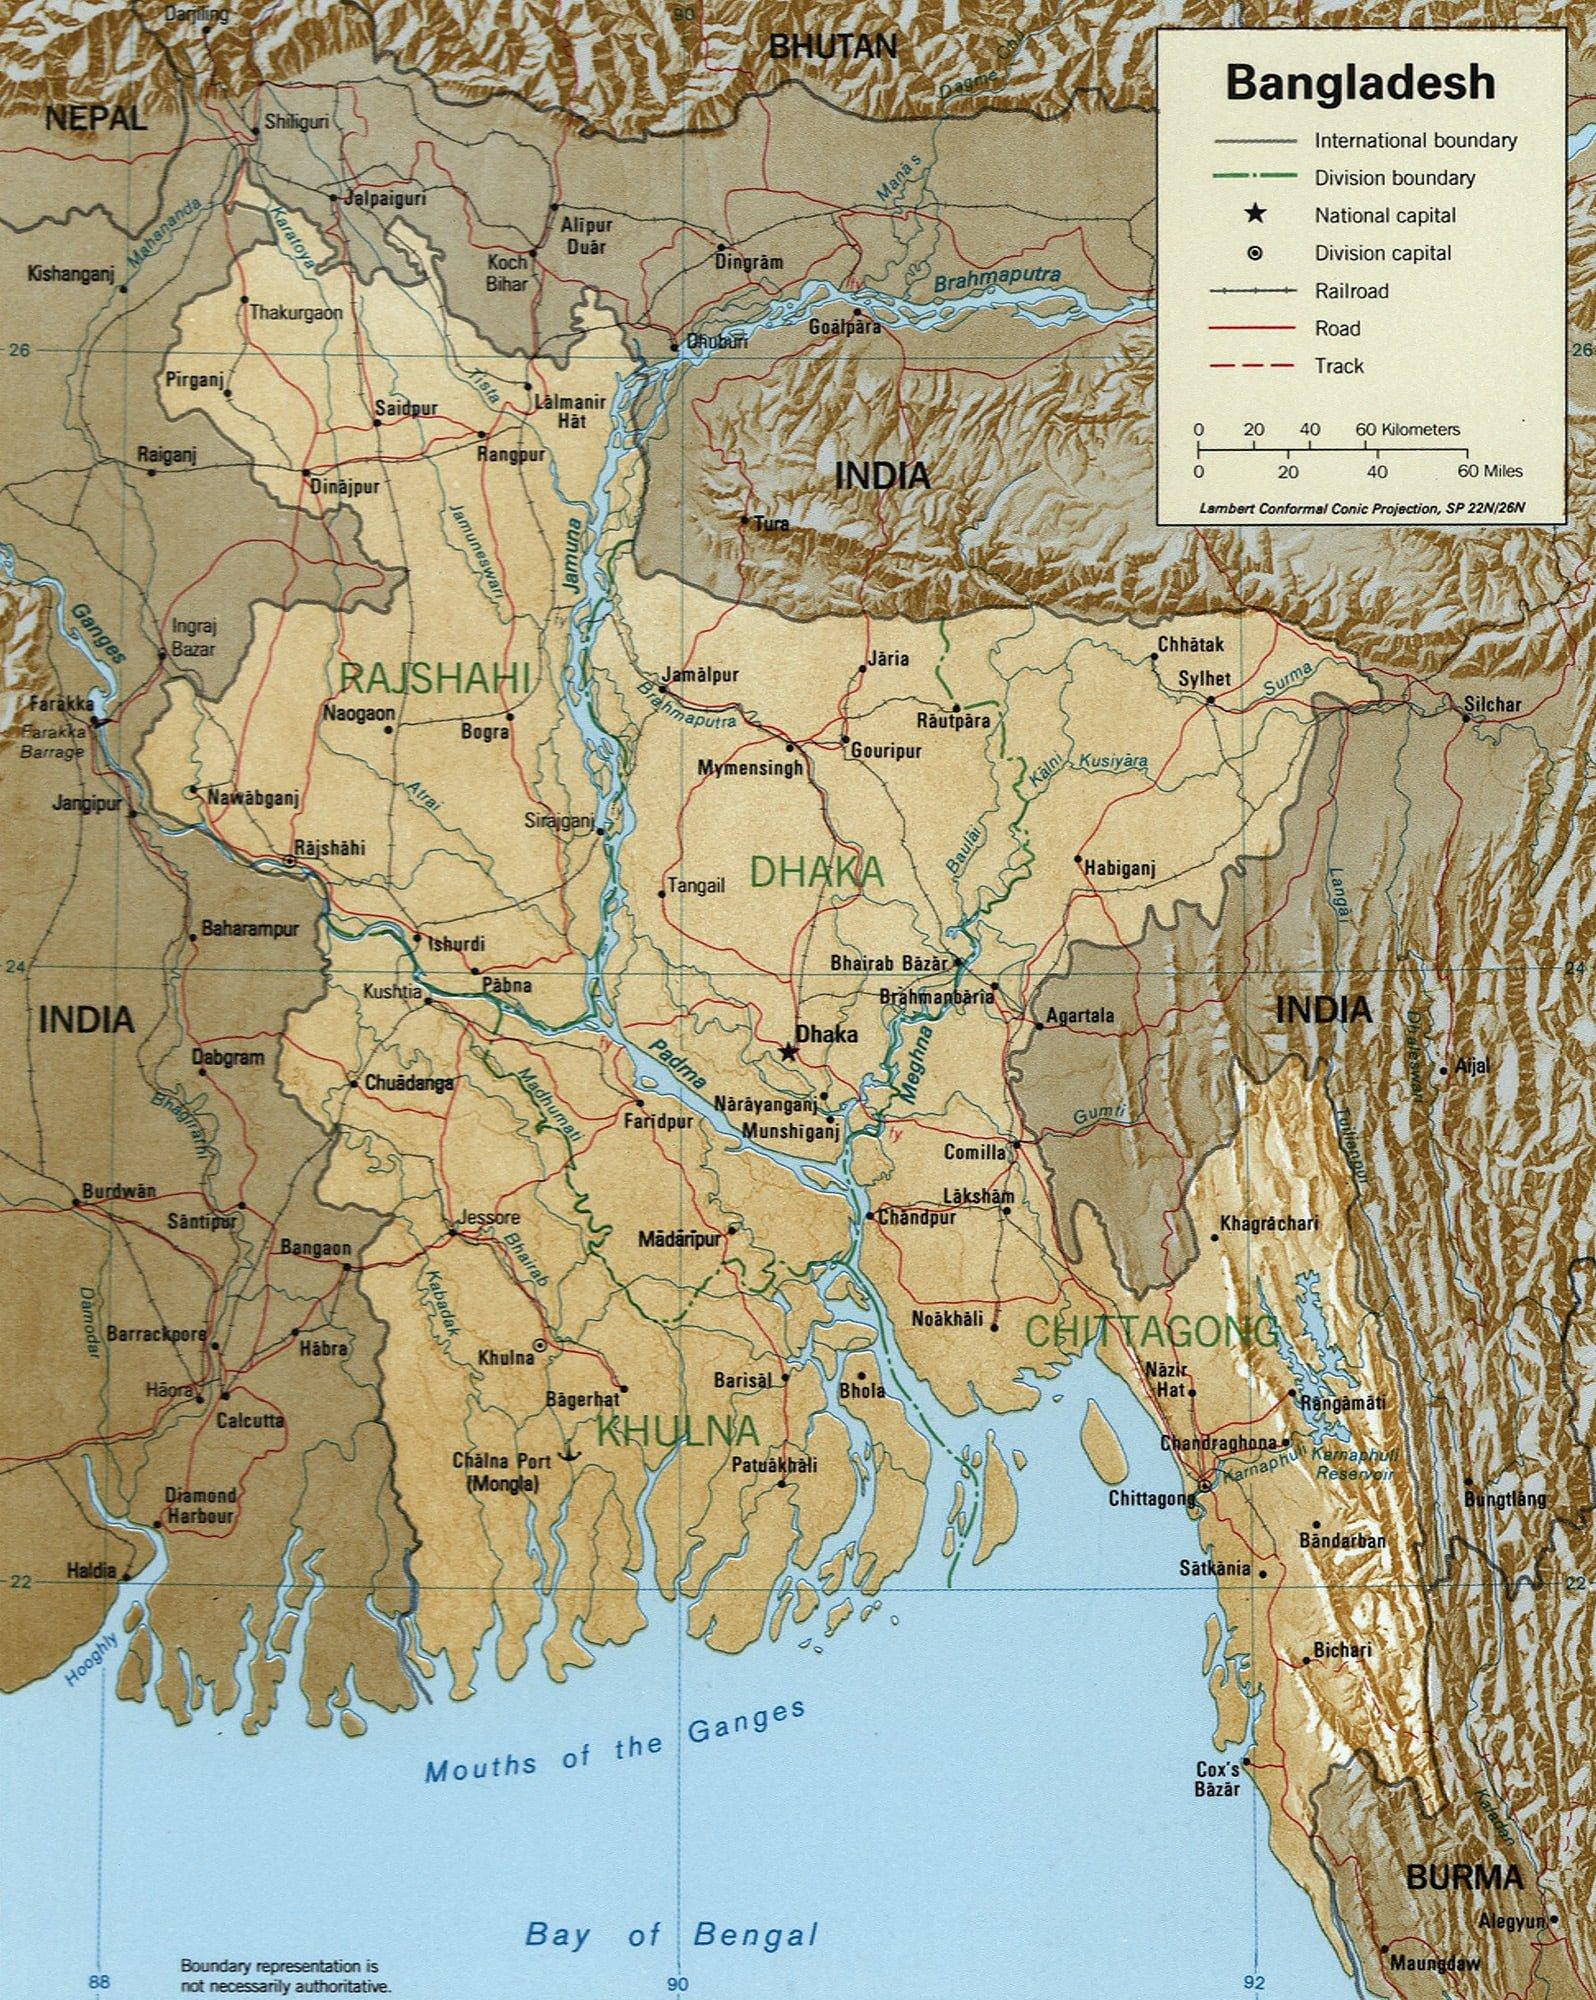 Rivers in Bangladesh